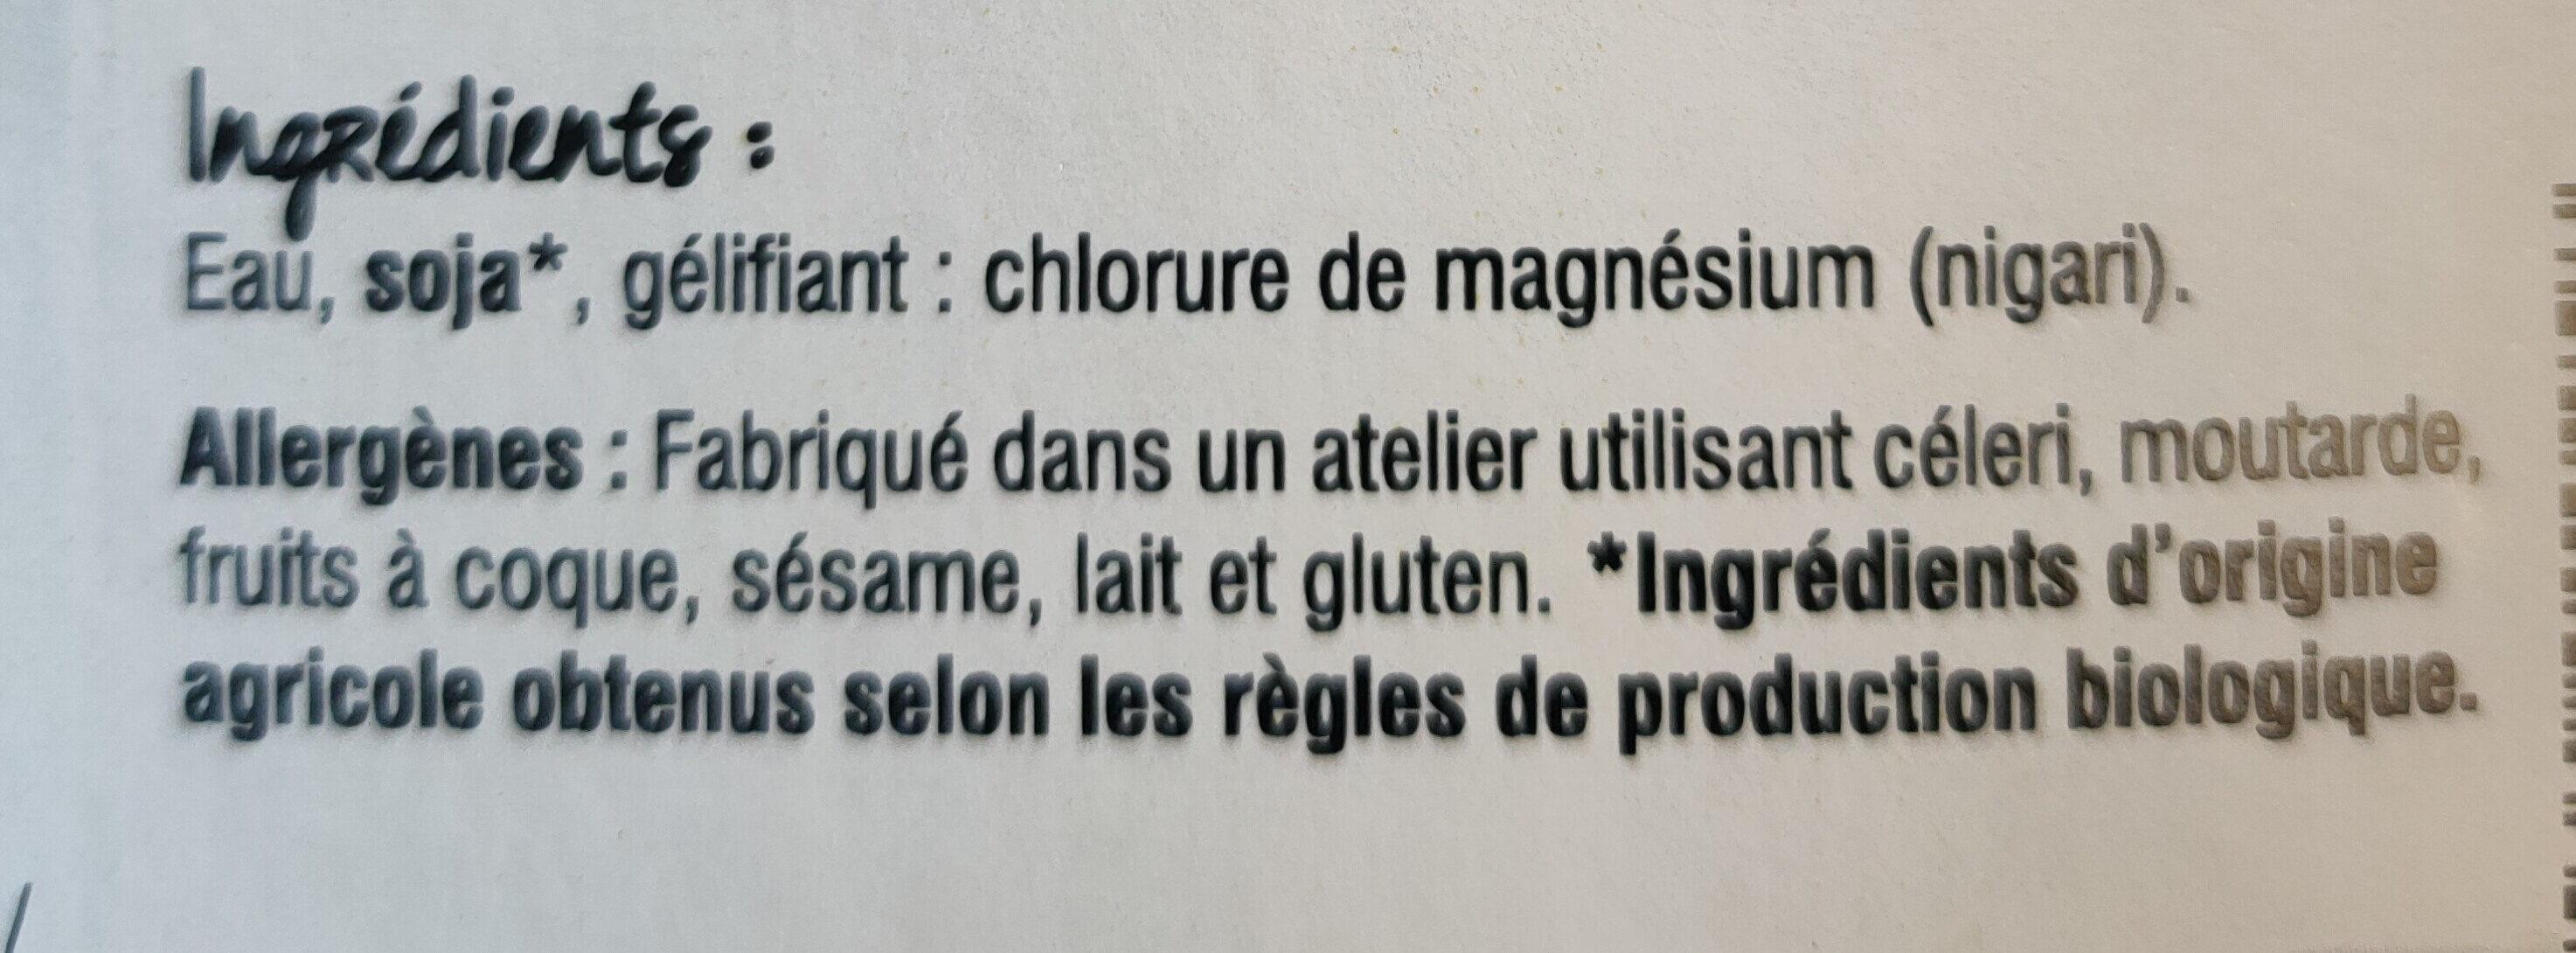 Tofu nature - Ingrédients - fr